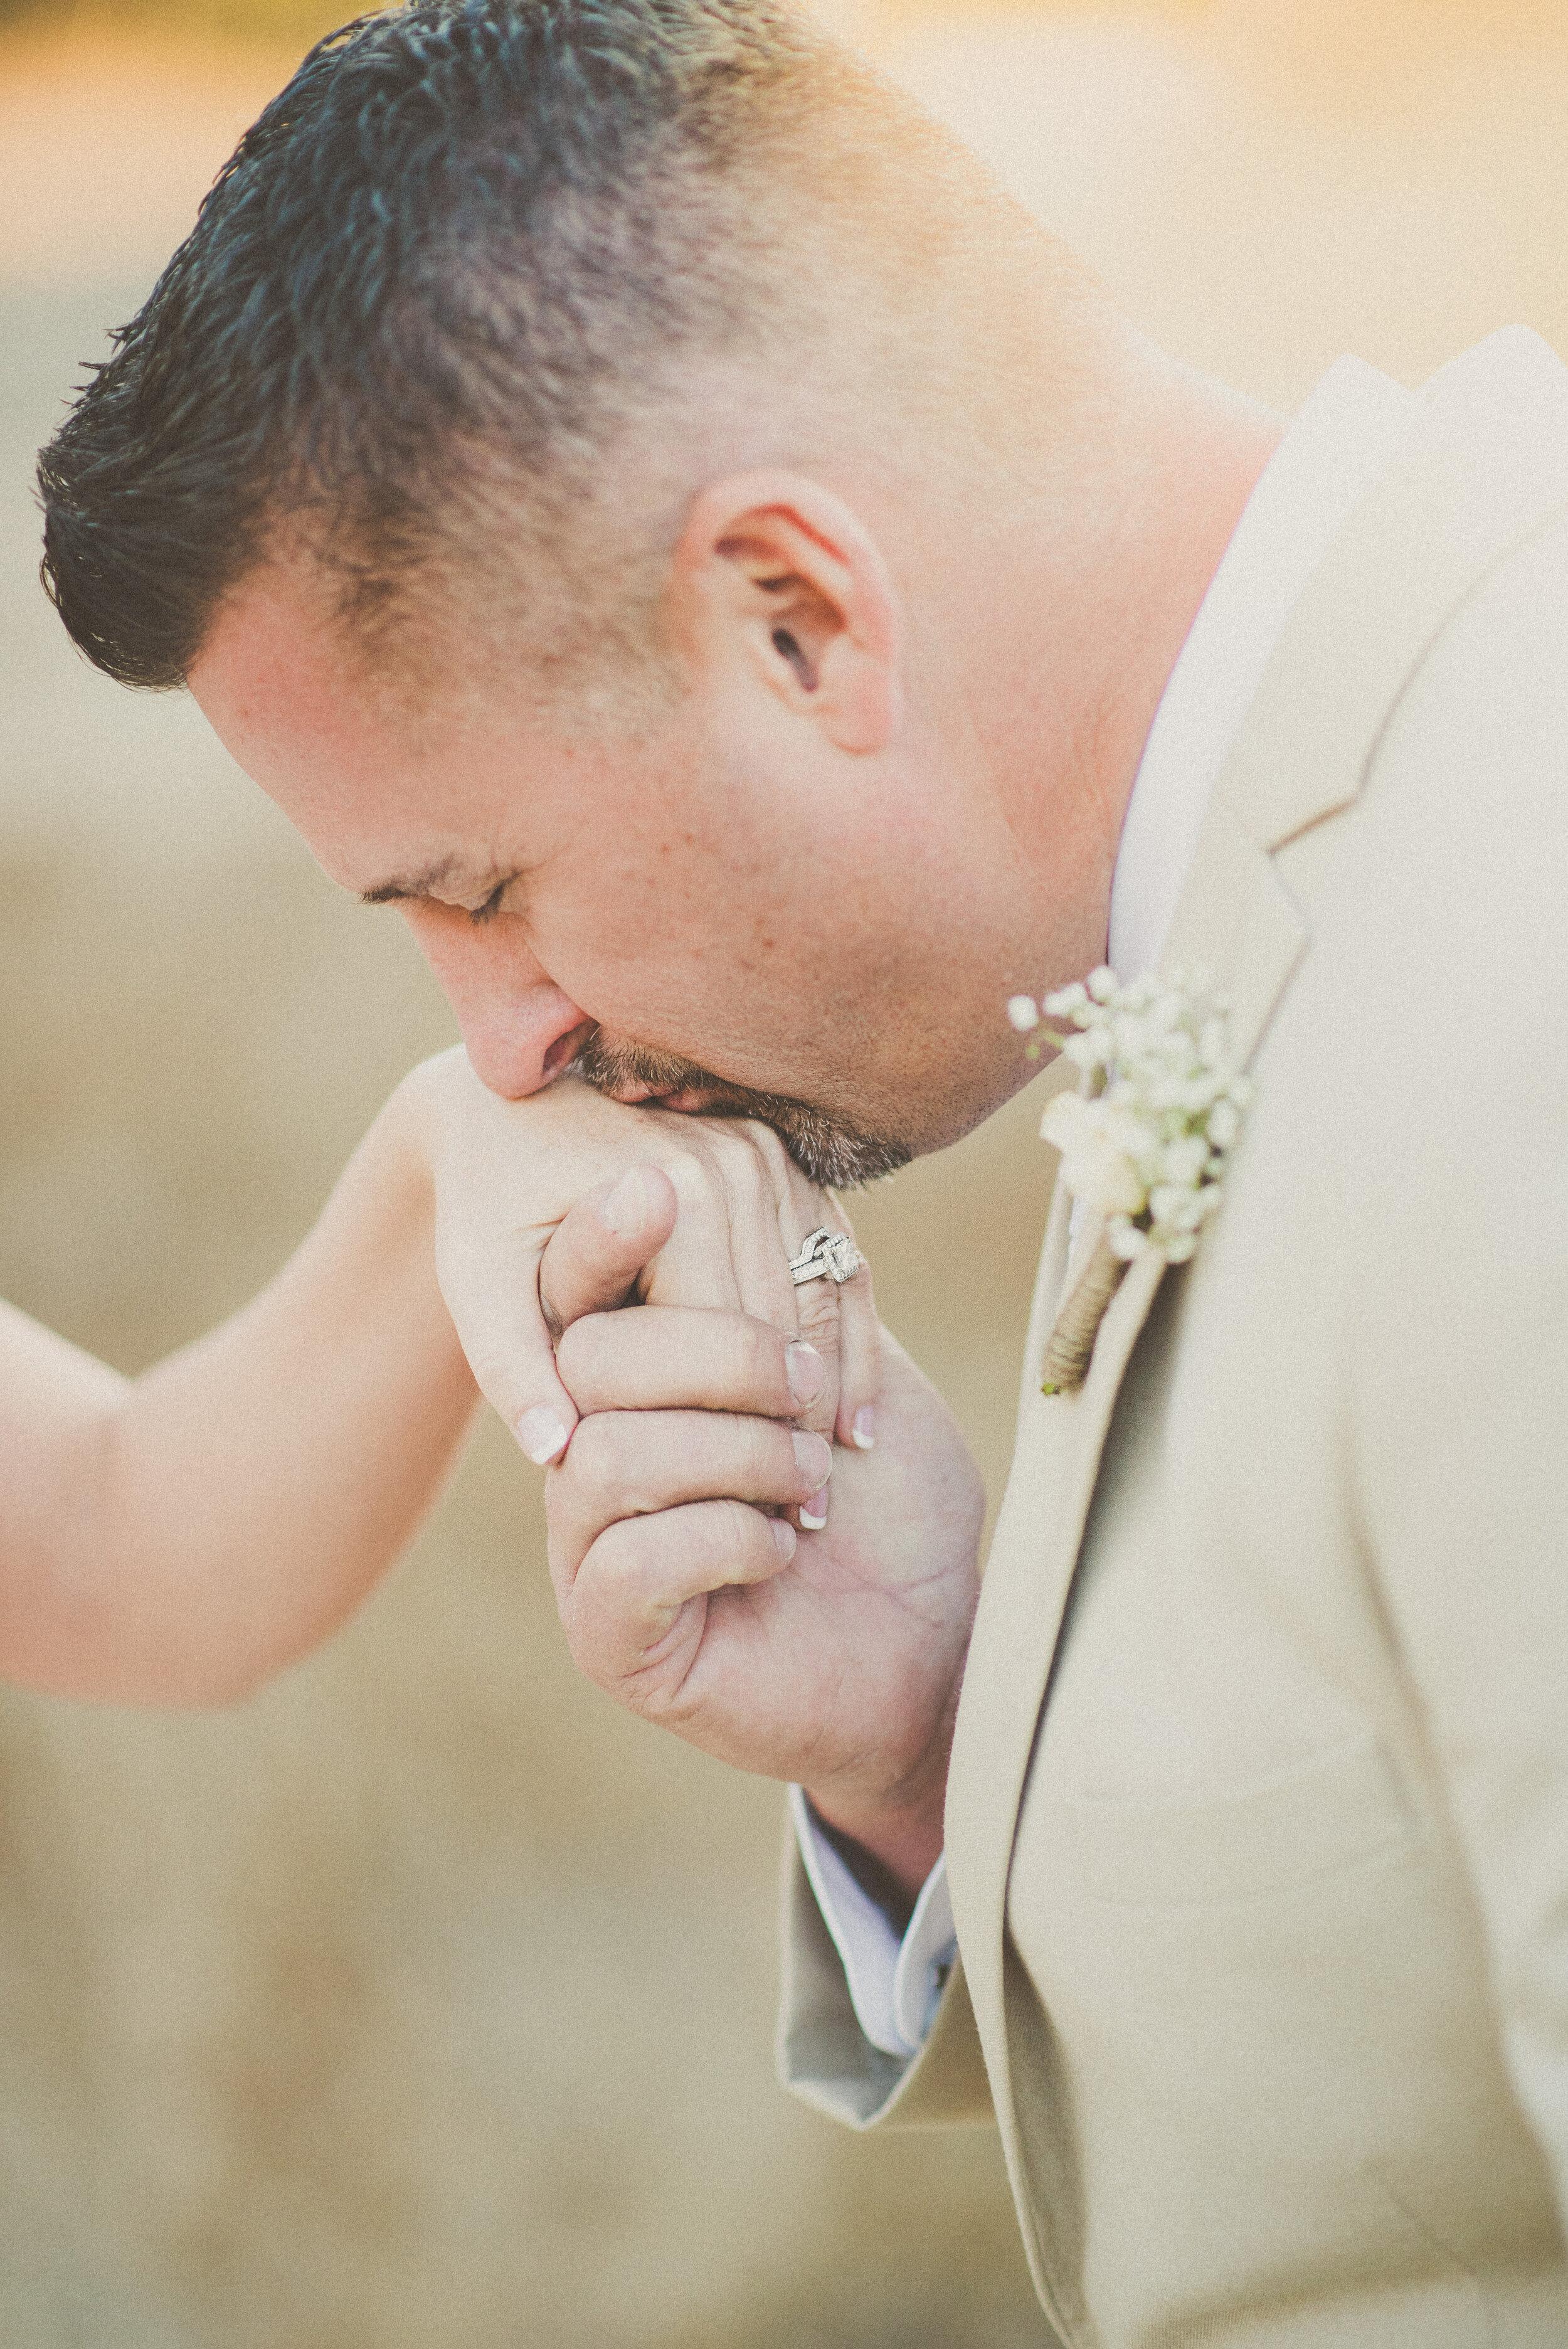 Roberts Wedding - Bride & Groom Portraits-28.jpg